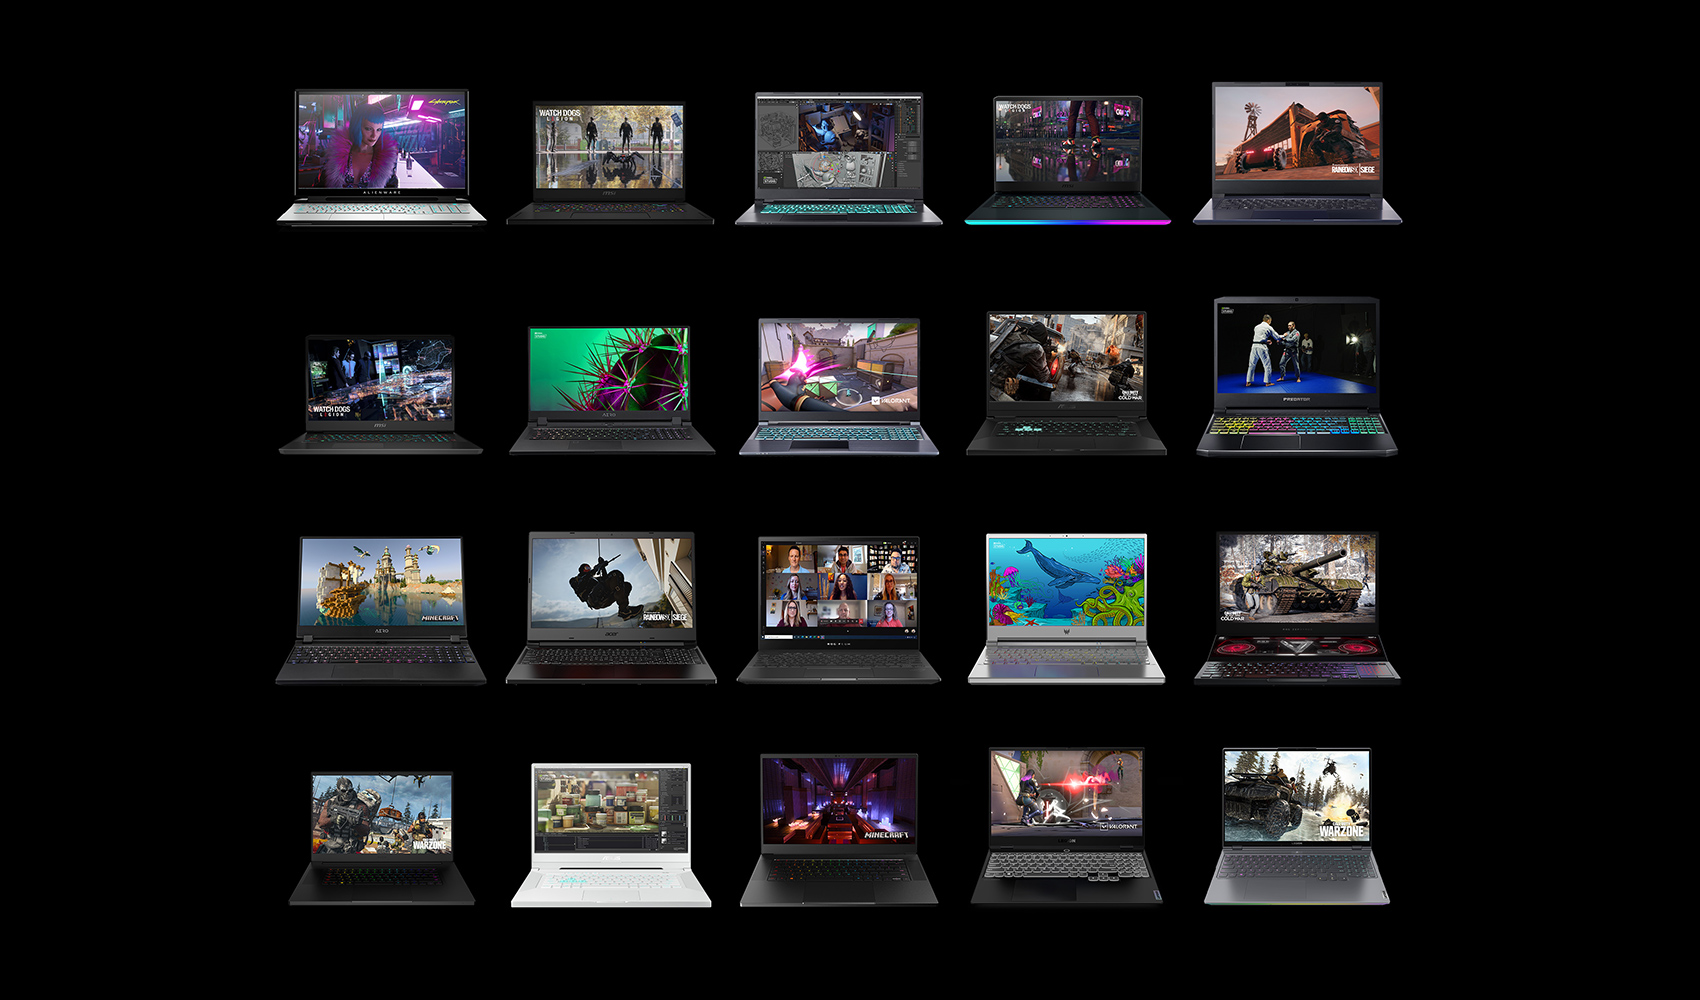 Media asset in full size related to 3dfxzone.it news item entitled as follows: NVIDIA annuncia la GeForce RTX 3060 e i notebook con GPU RTX 30 mobile | Image Name: news31546_NVIDIA-CES-2021_5.jpg